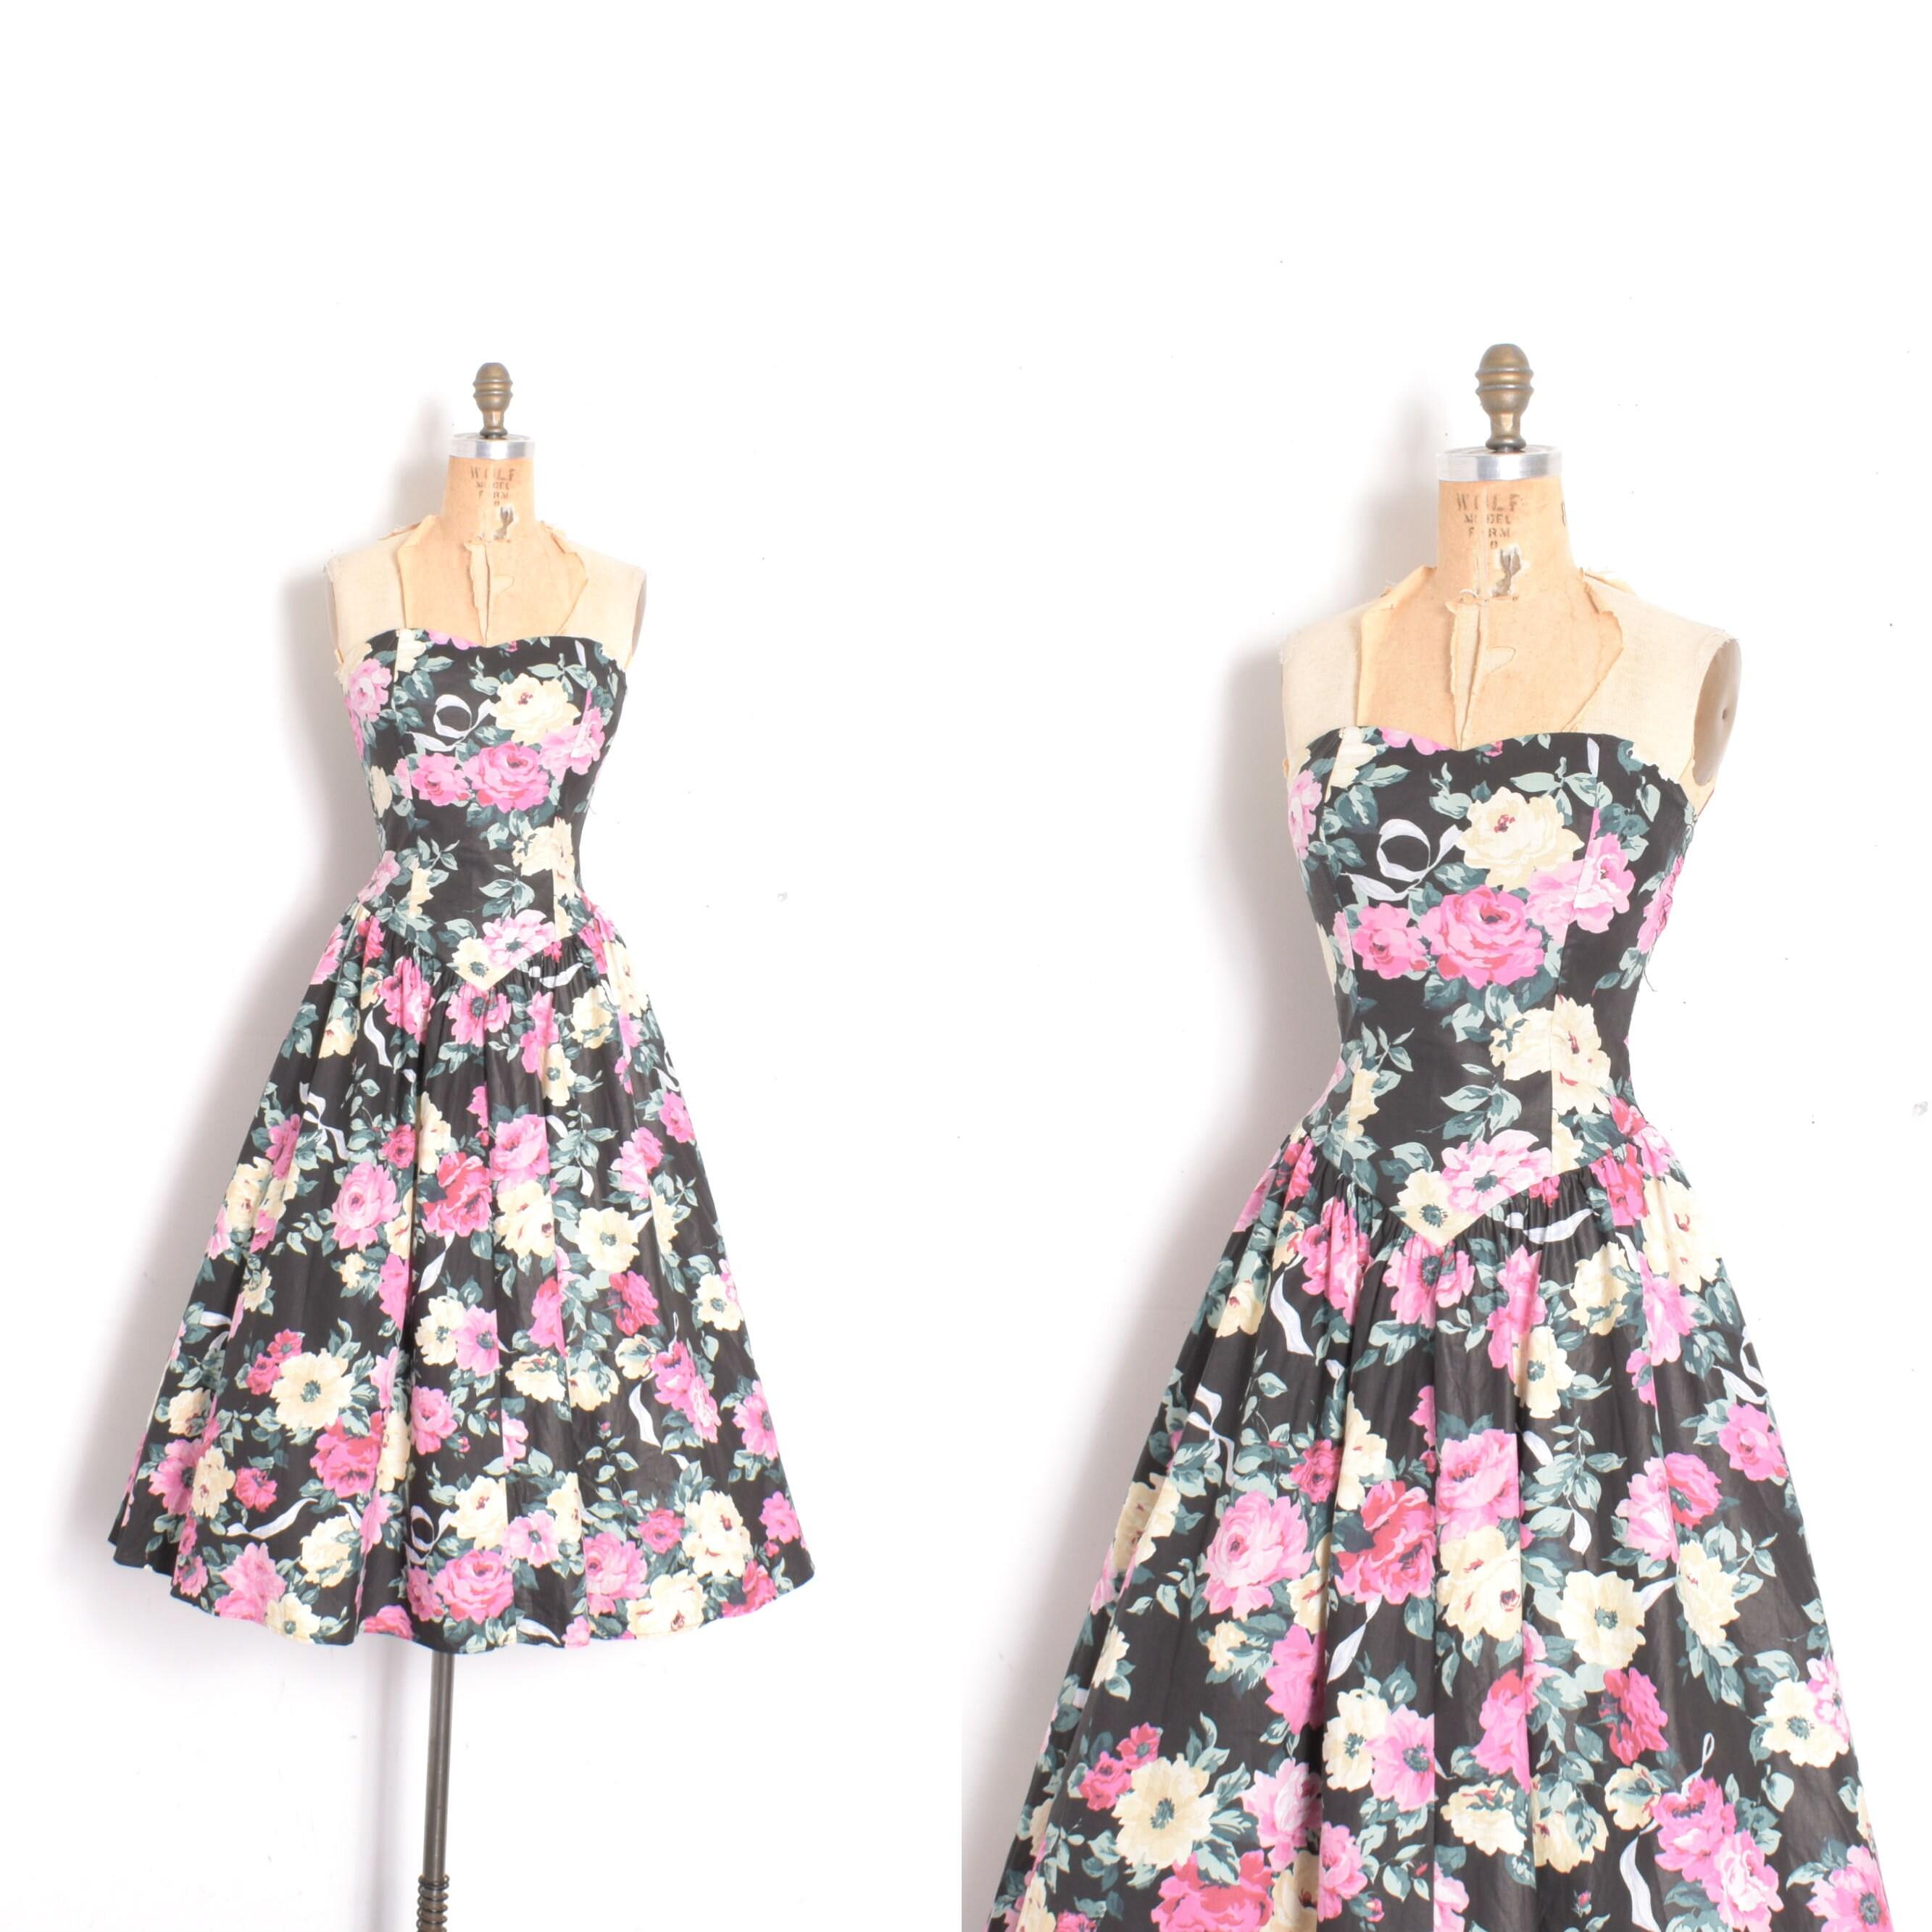 80s Dresses | Casual to Party Dresses Vintage 1980S Dress80S Dark Floral Strapless Cotton Black Pink  Xs S $88.00 AT vintagedancer.com